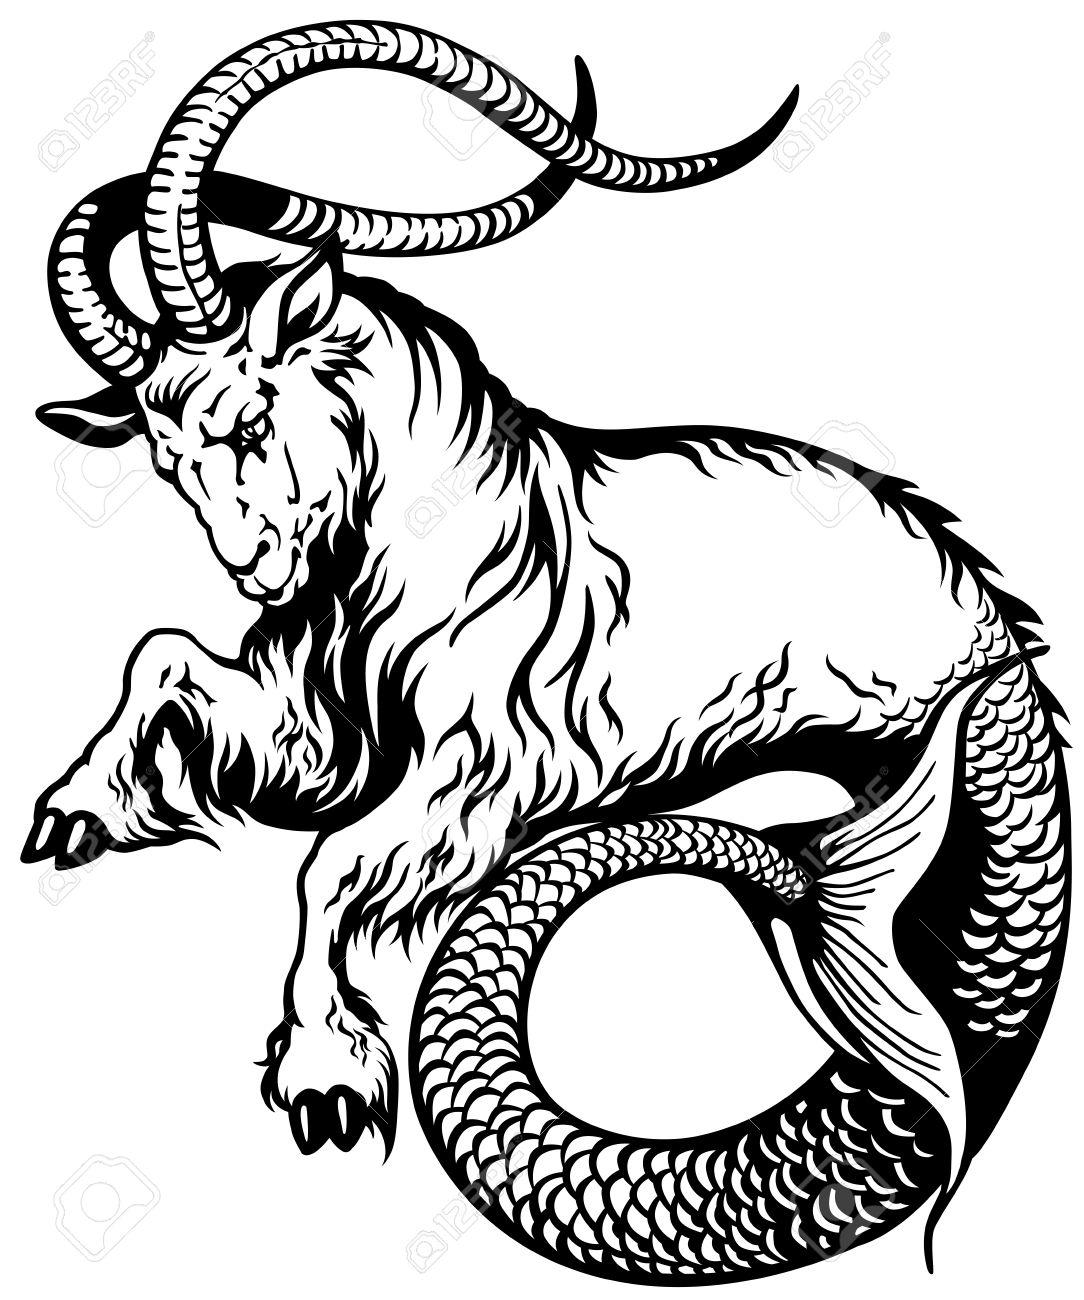 myths symbols sandplay: Goat Symbolism